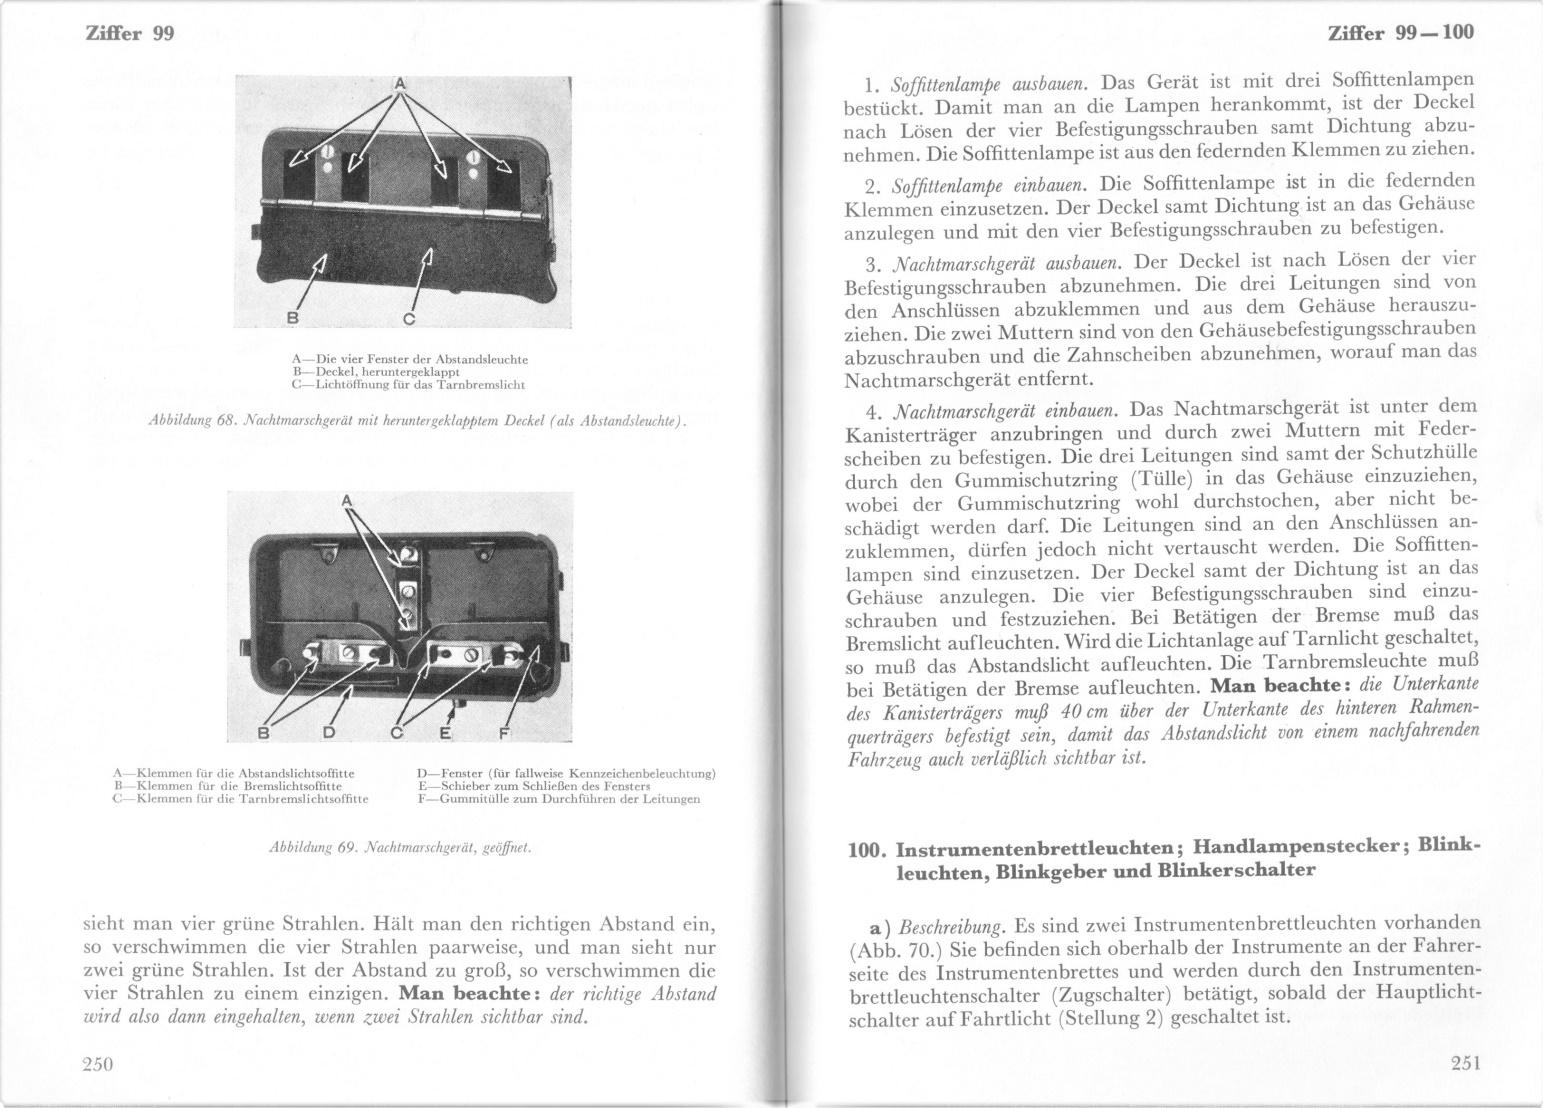 D:\Archiv Nemeth\Fzg-Gerät-Ausrüstung\Fahrzeuge\Mehrspurige Kfz\BH Fahrzeuge\Jeep\TV 9-803 Ausschnitt\Notek.jpeg